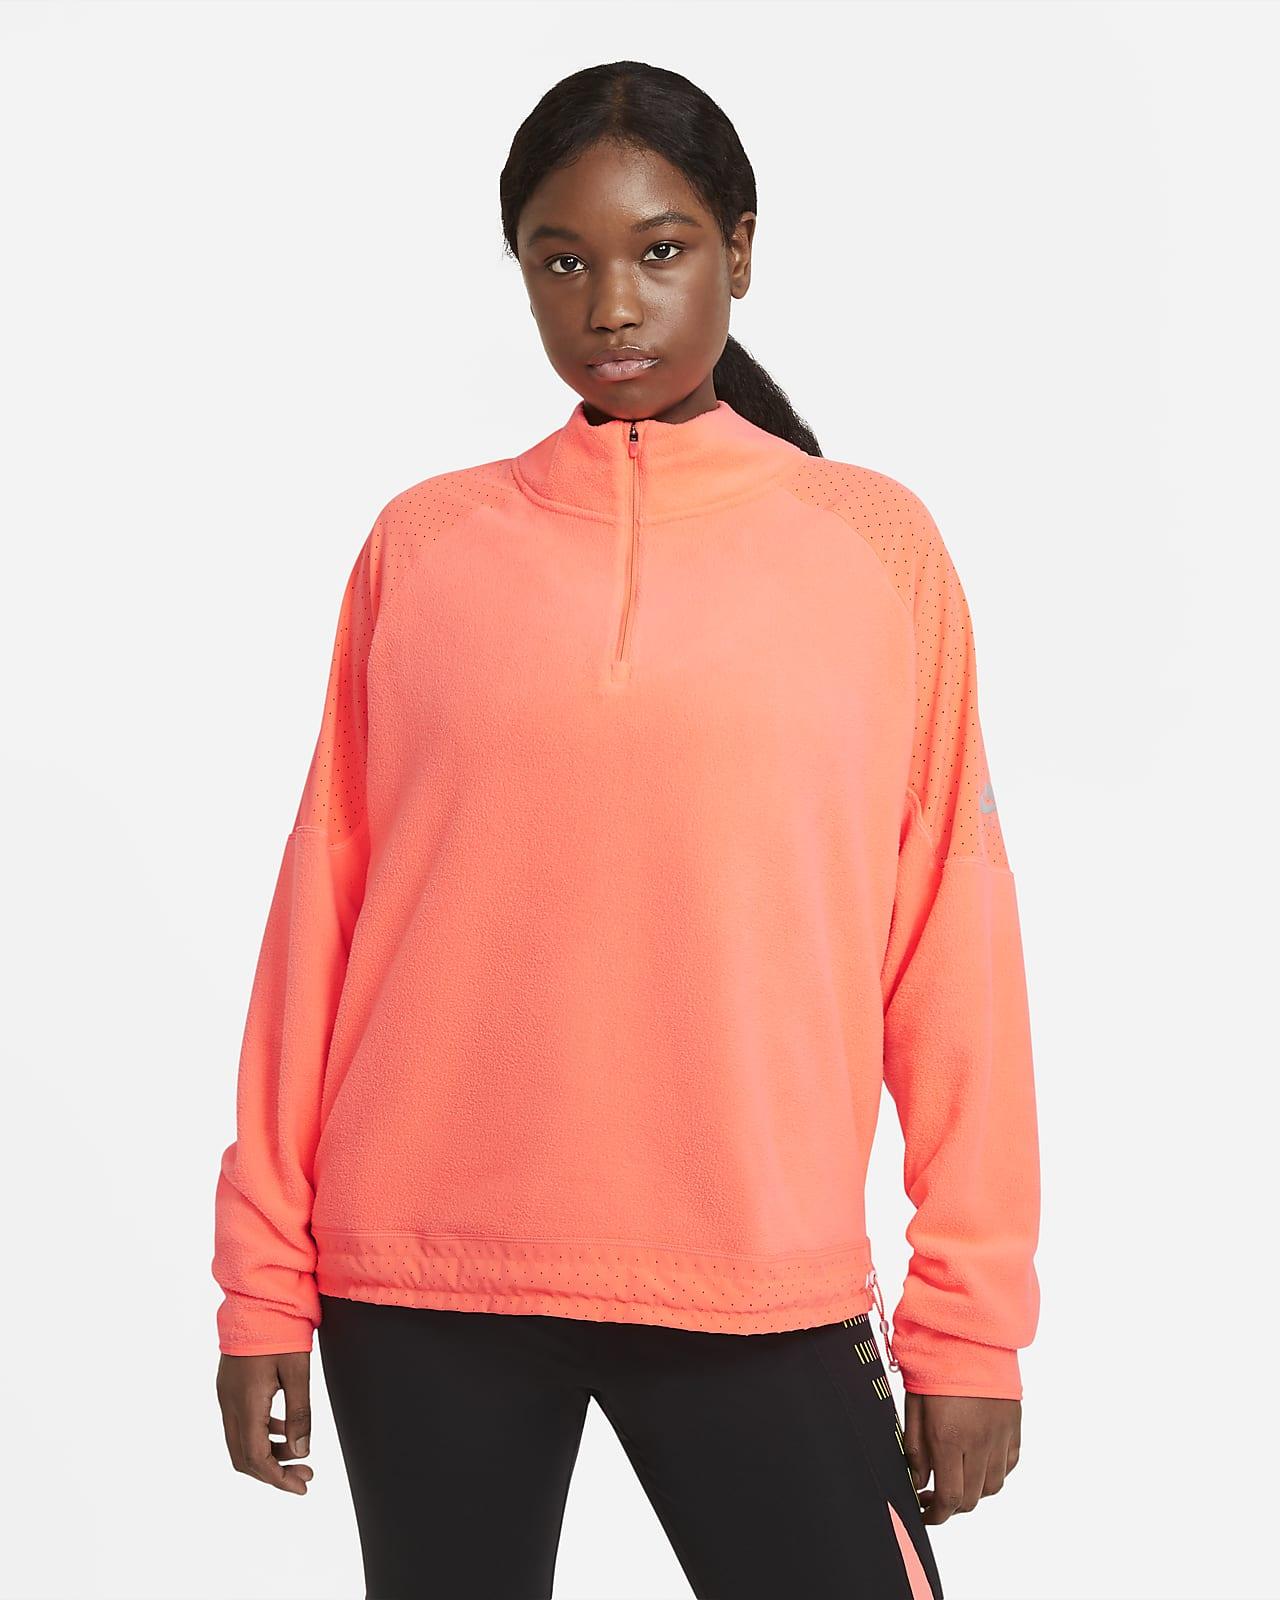 Nike Air Midlayer Camiseta de running (Talla grande) - Mujer